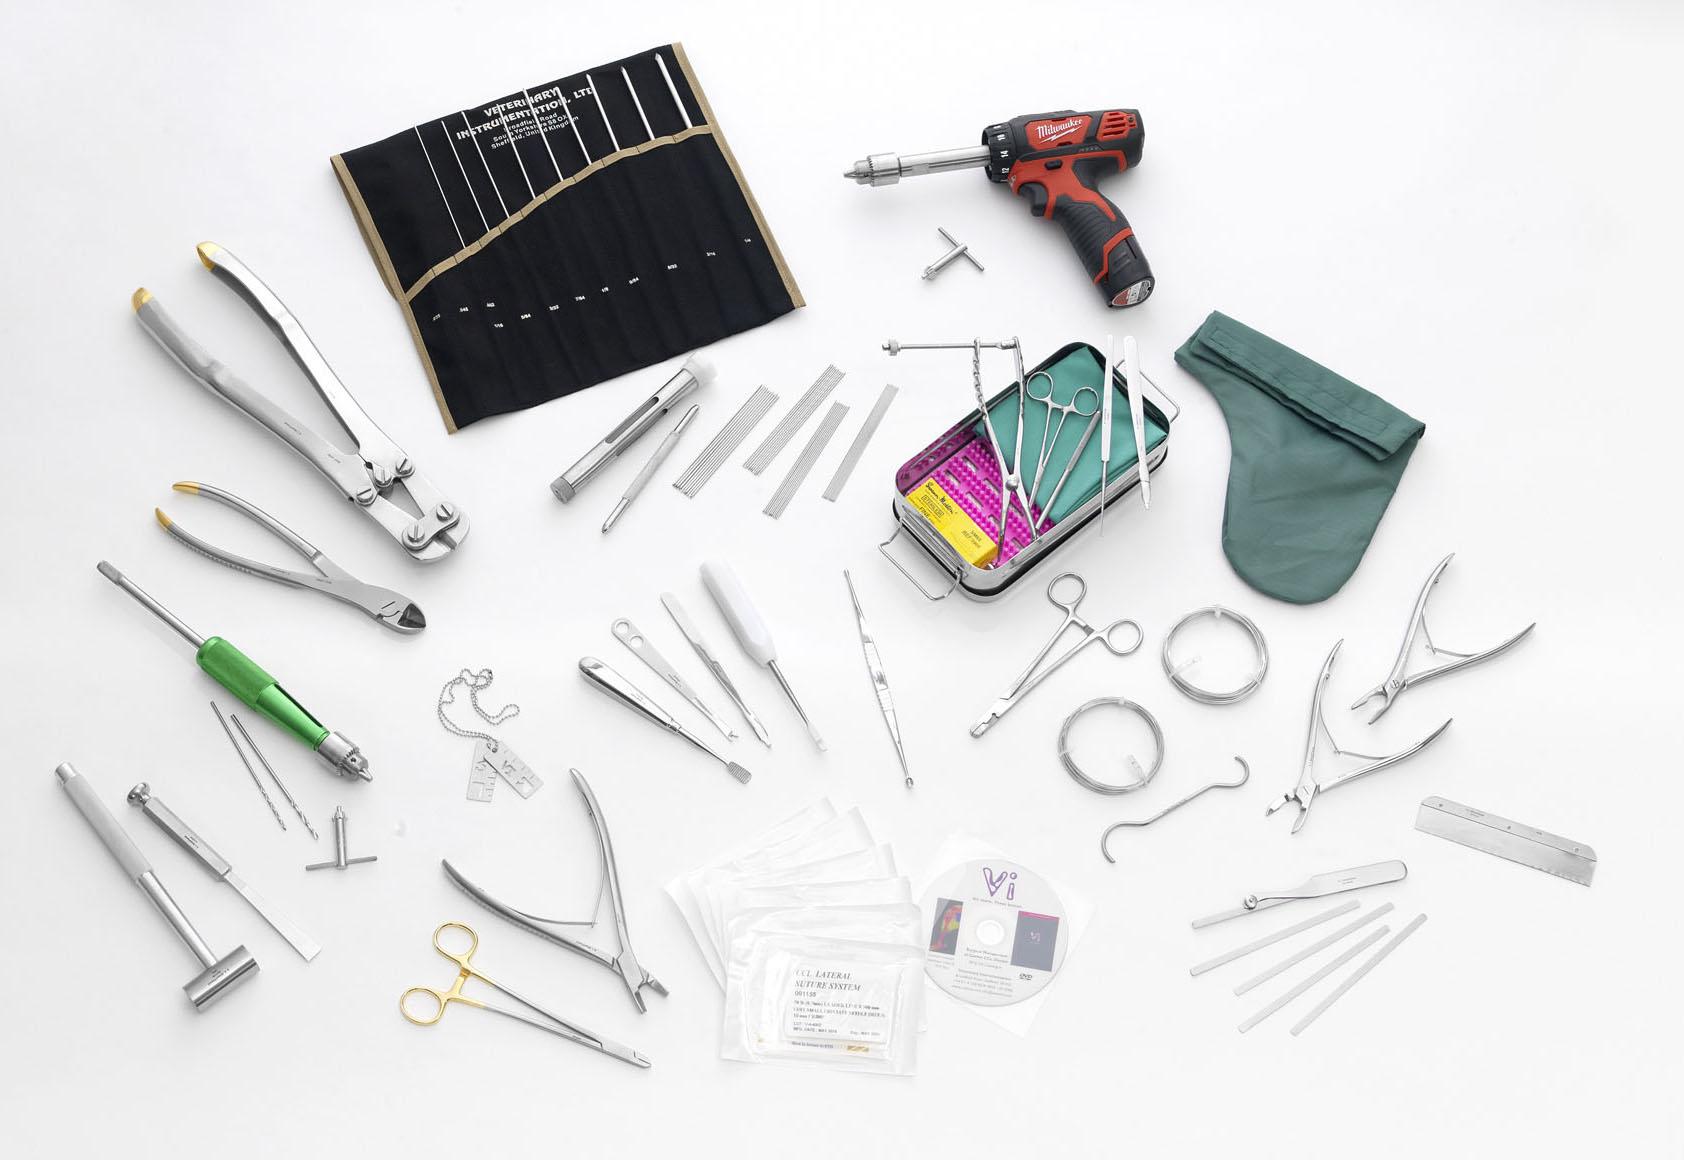 VI Orthopaedic Starter Kits